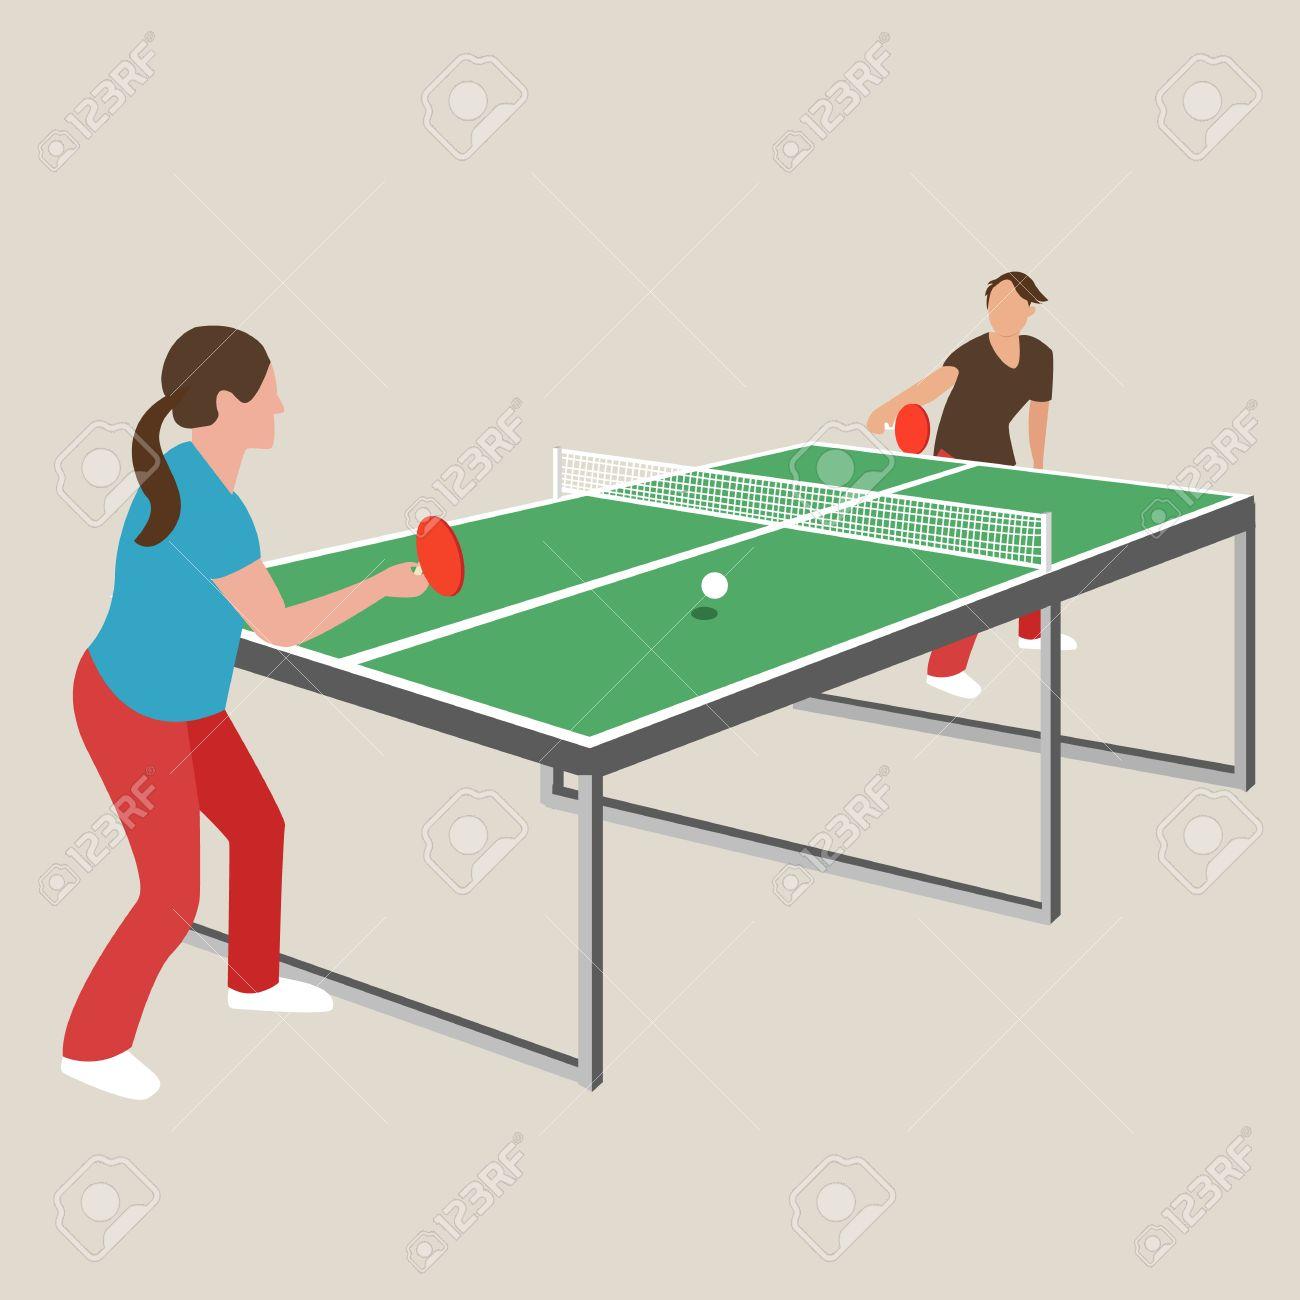 Tenis De Mesa De Ping Pong Mujer Mujer Nina Deportista Dibujo Juegos